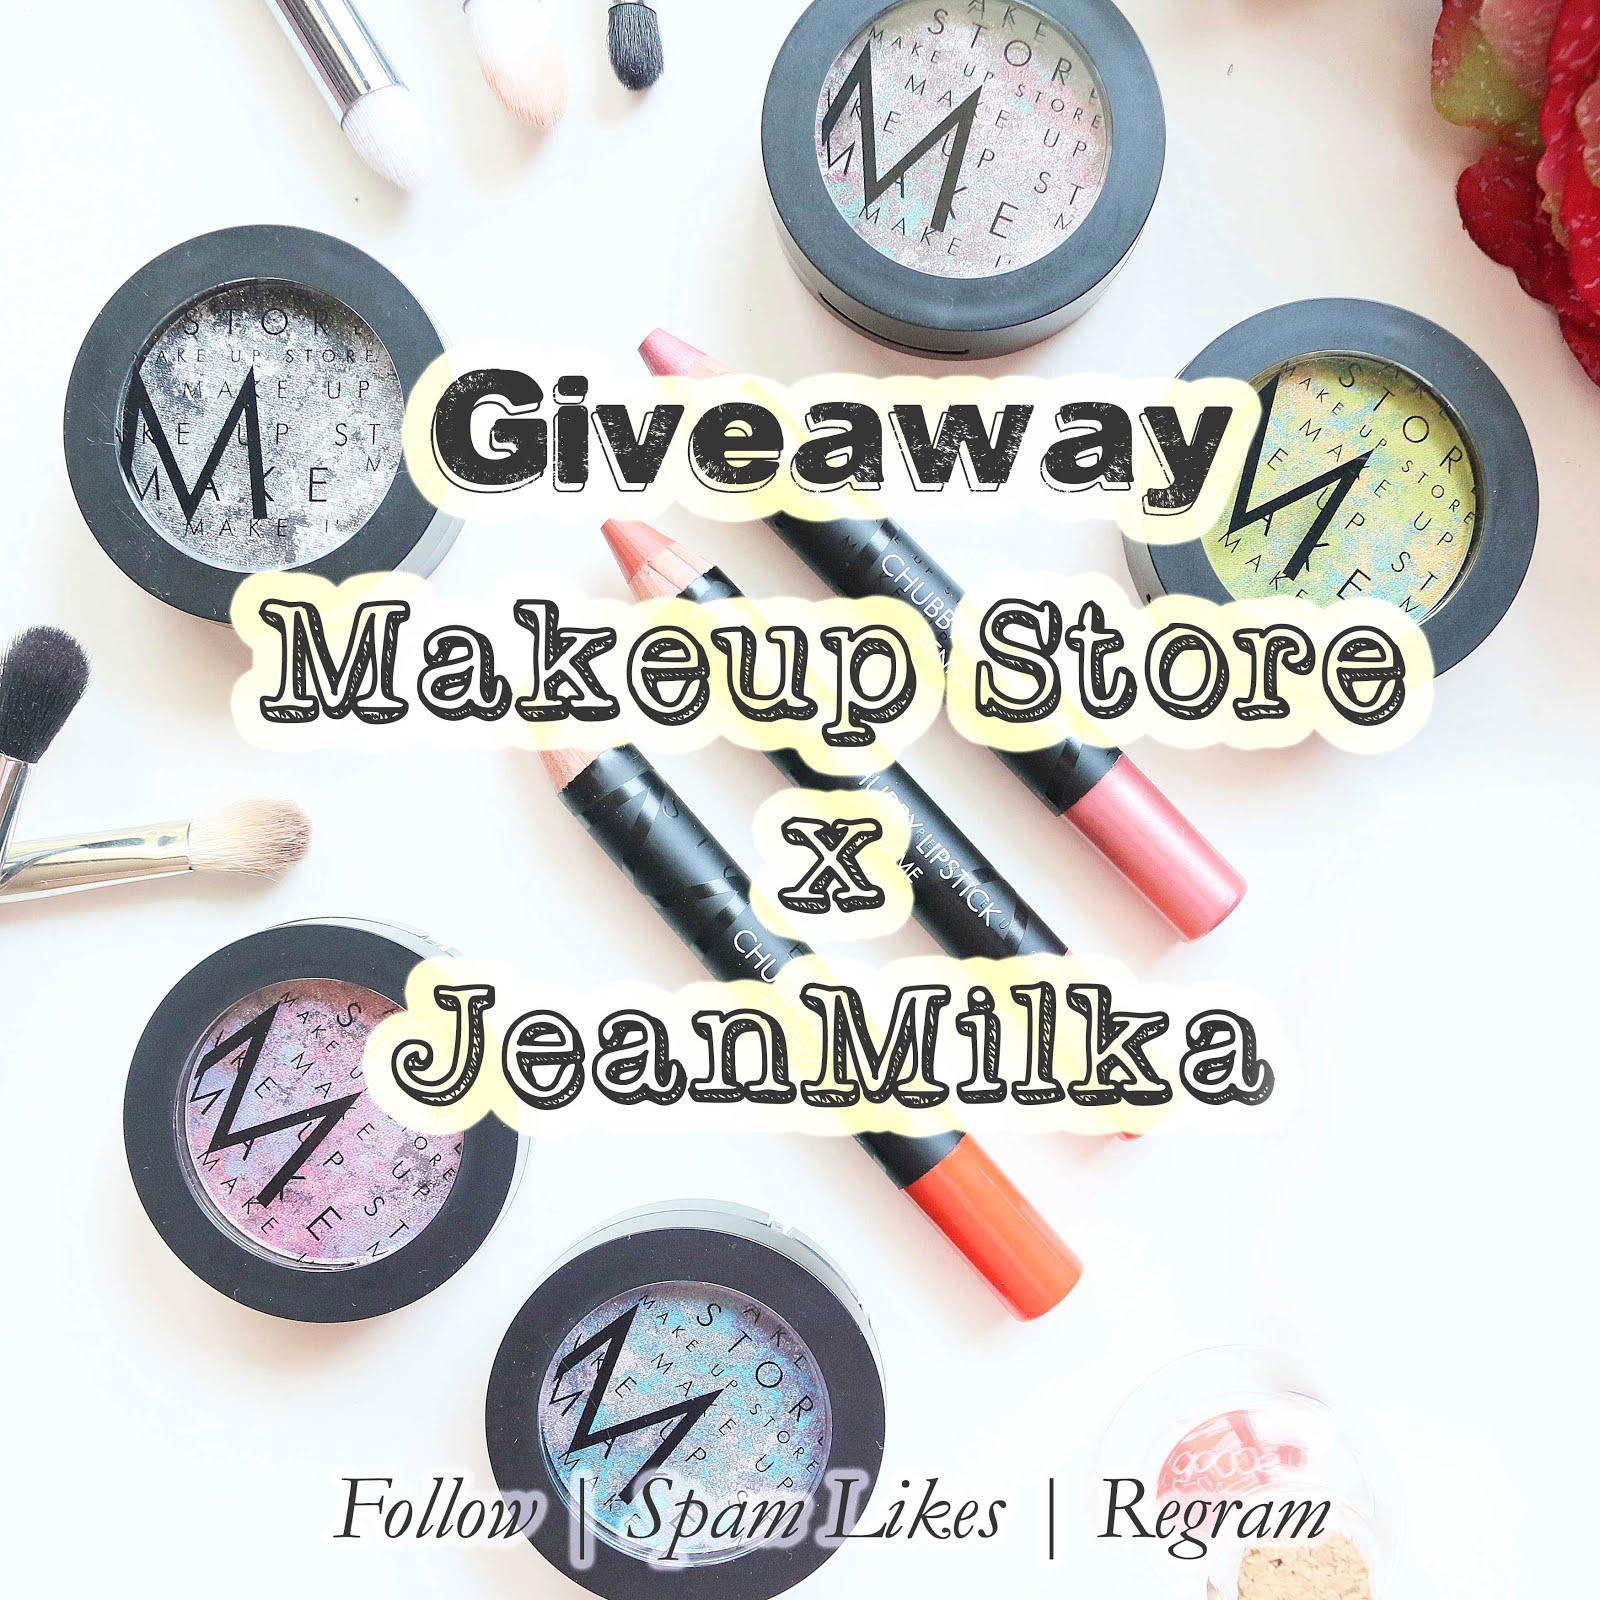 Jean Milka: Video Tutorial : Romantic Makeup Look for Date